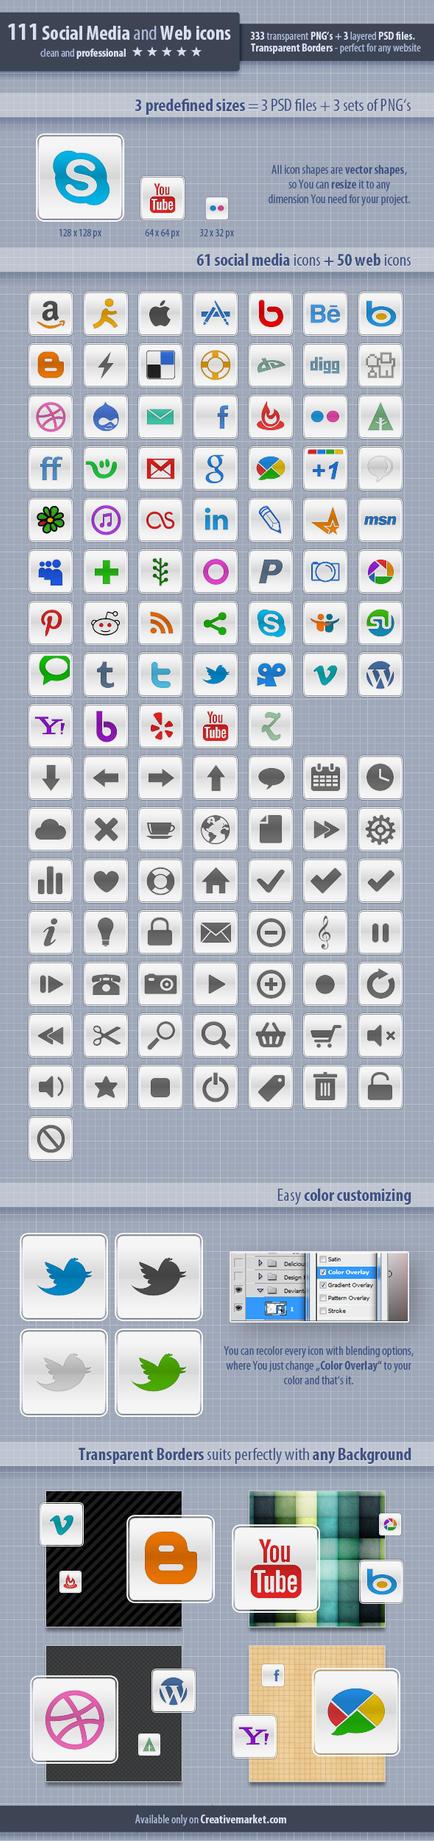 111 Social Meda and Web Icons by survivorcz